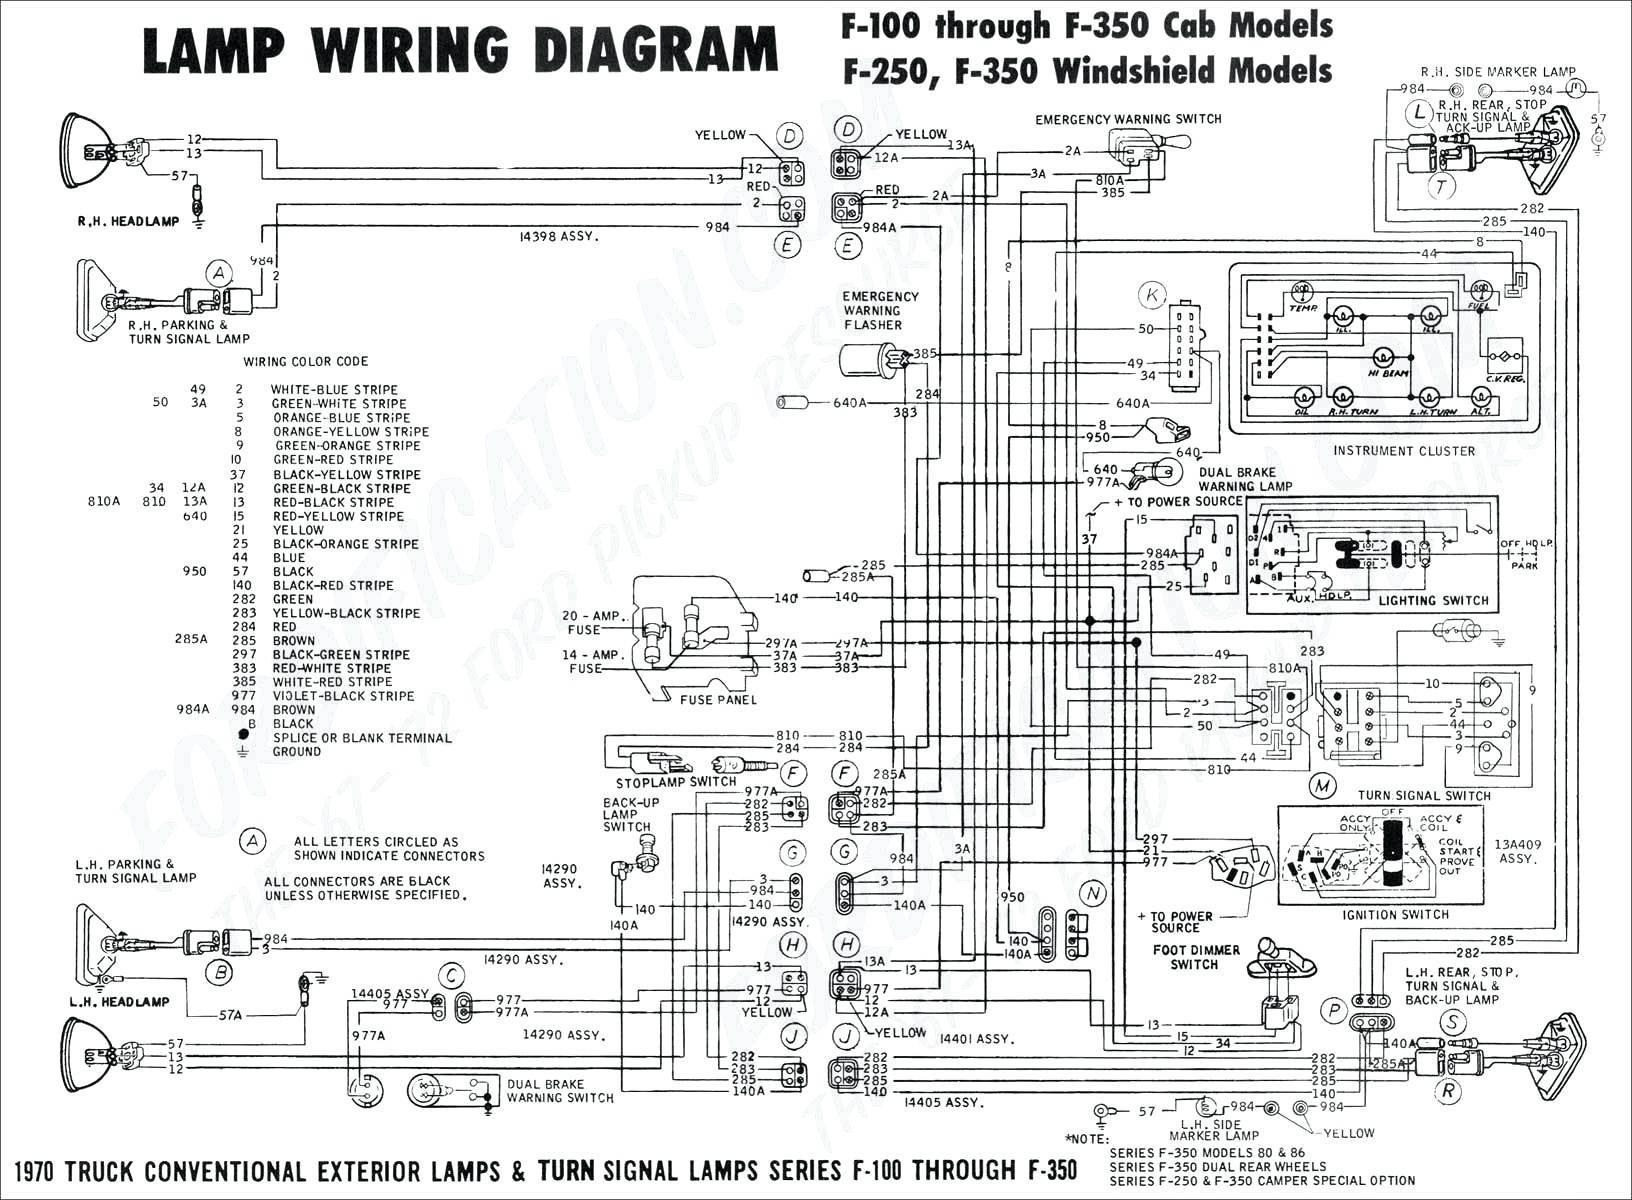 Harley Davidson Radio Wiring Diagram Harley Davidson Radio Wiring Diagram Best ford F 350 Wiring Of Harley Davidson Radio Wiring Diagram